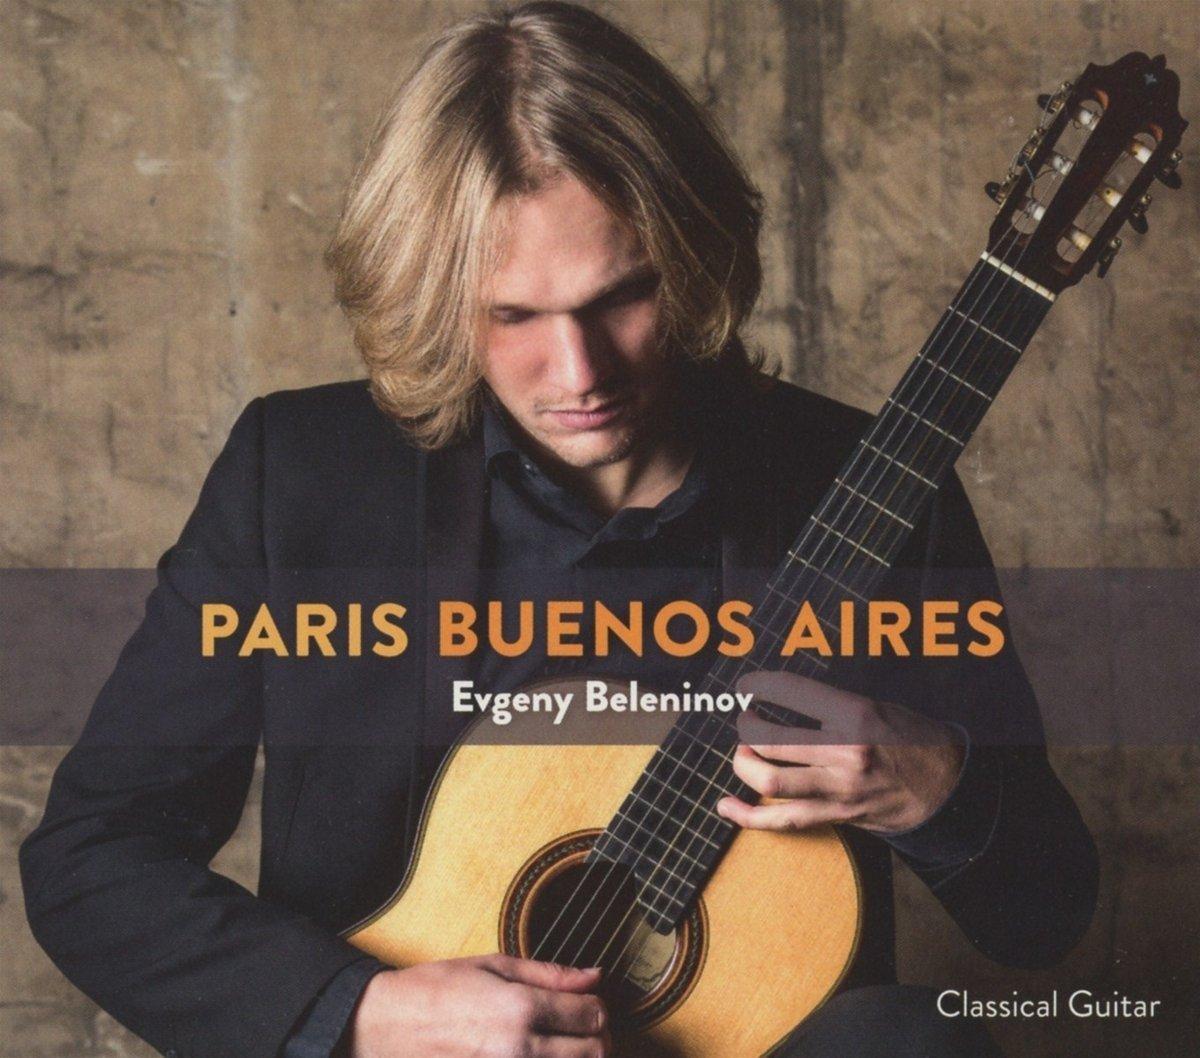 Paris Buenos Aires, Evgeny Beleninov